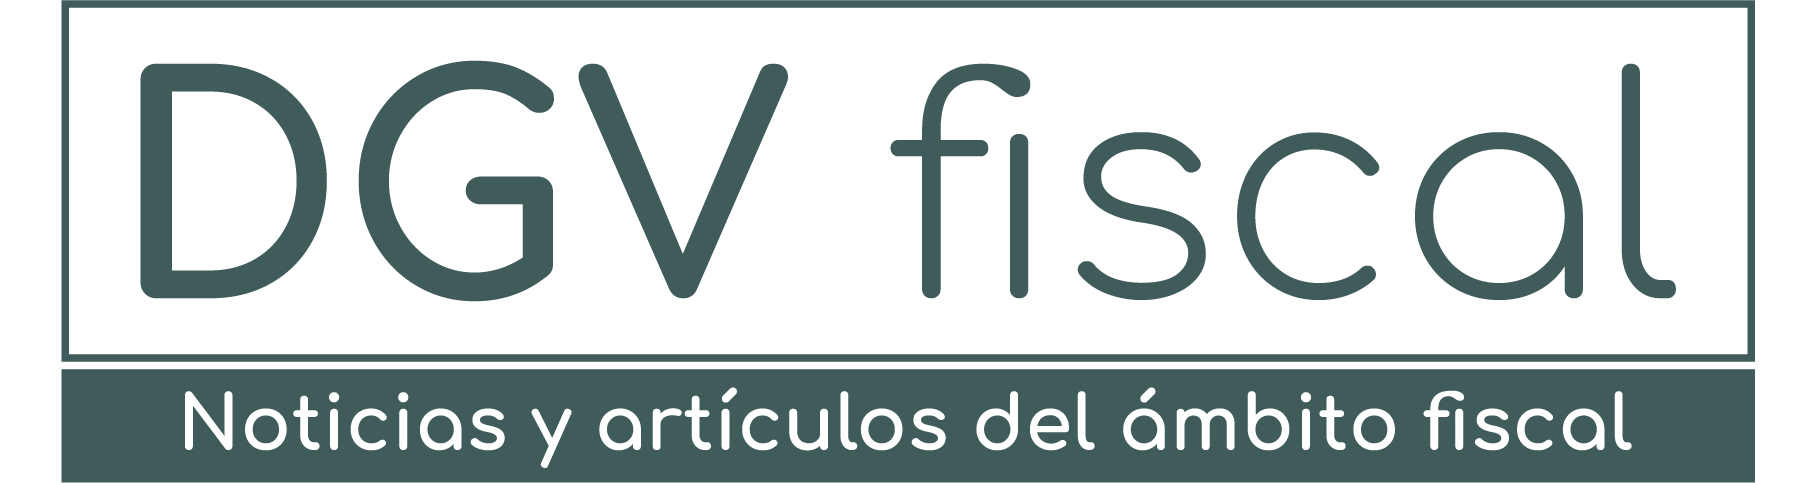 DGV Fiscal